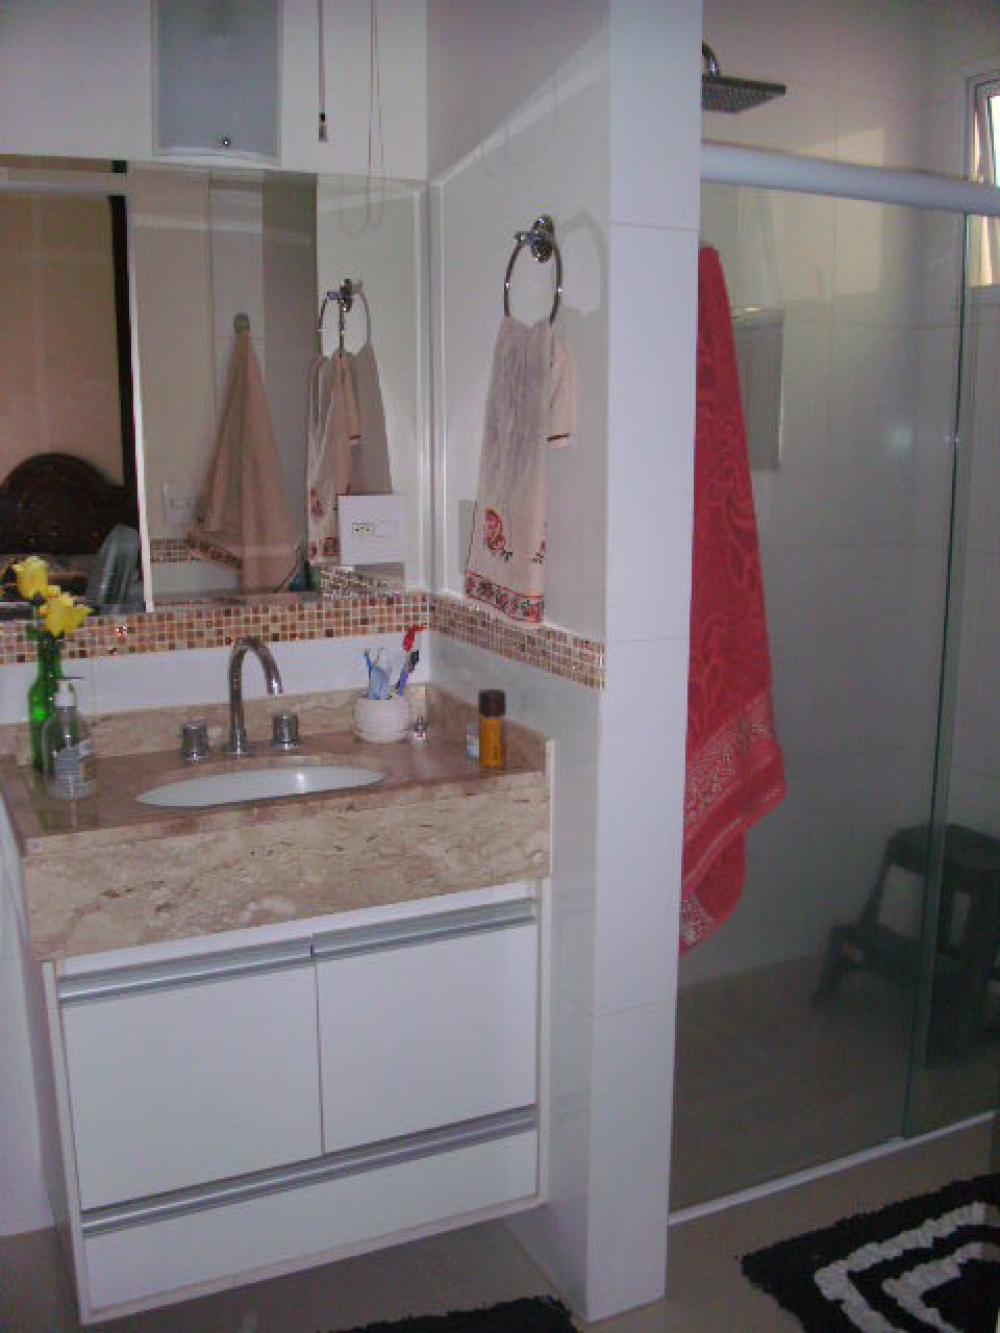 Comprar Casa / Condomínio em Mirassol R$ 750.000,00 - Foto 6